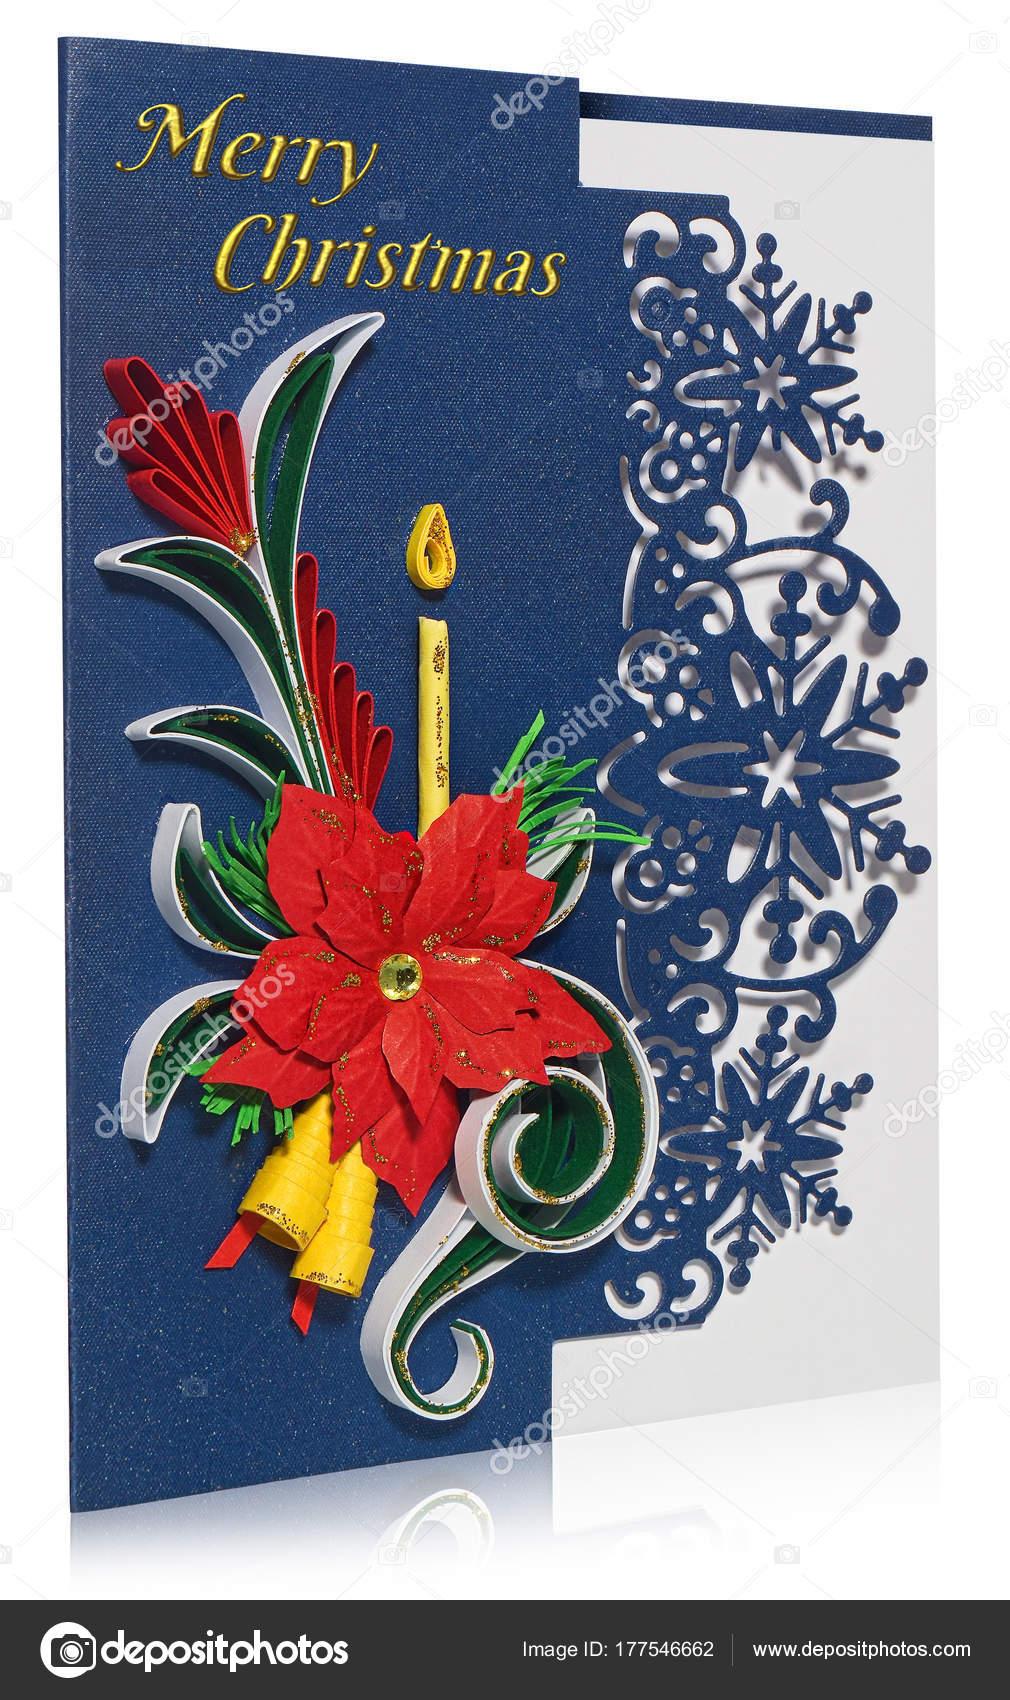 Handmade Christmas Card With Merry Christmas Greetings And Poins